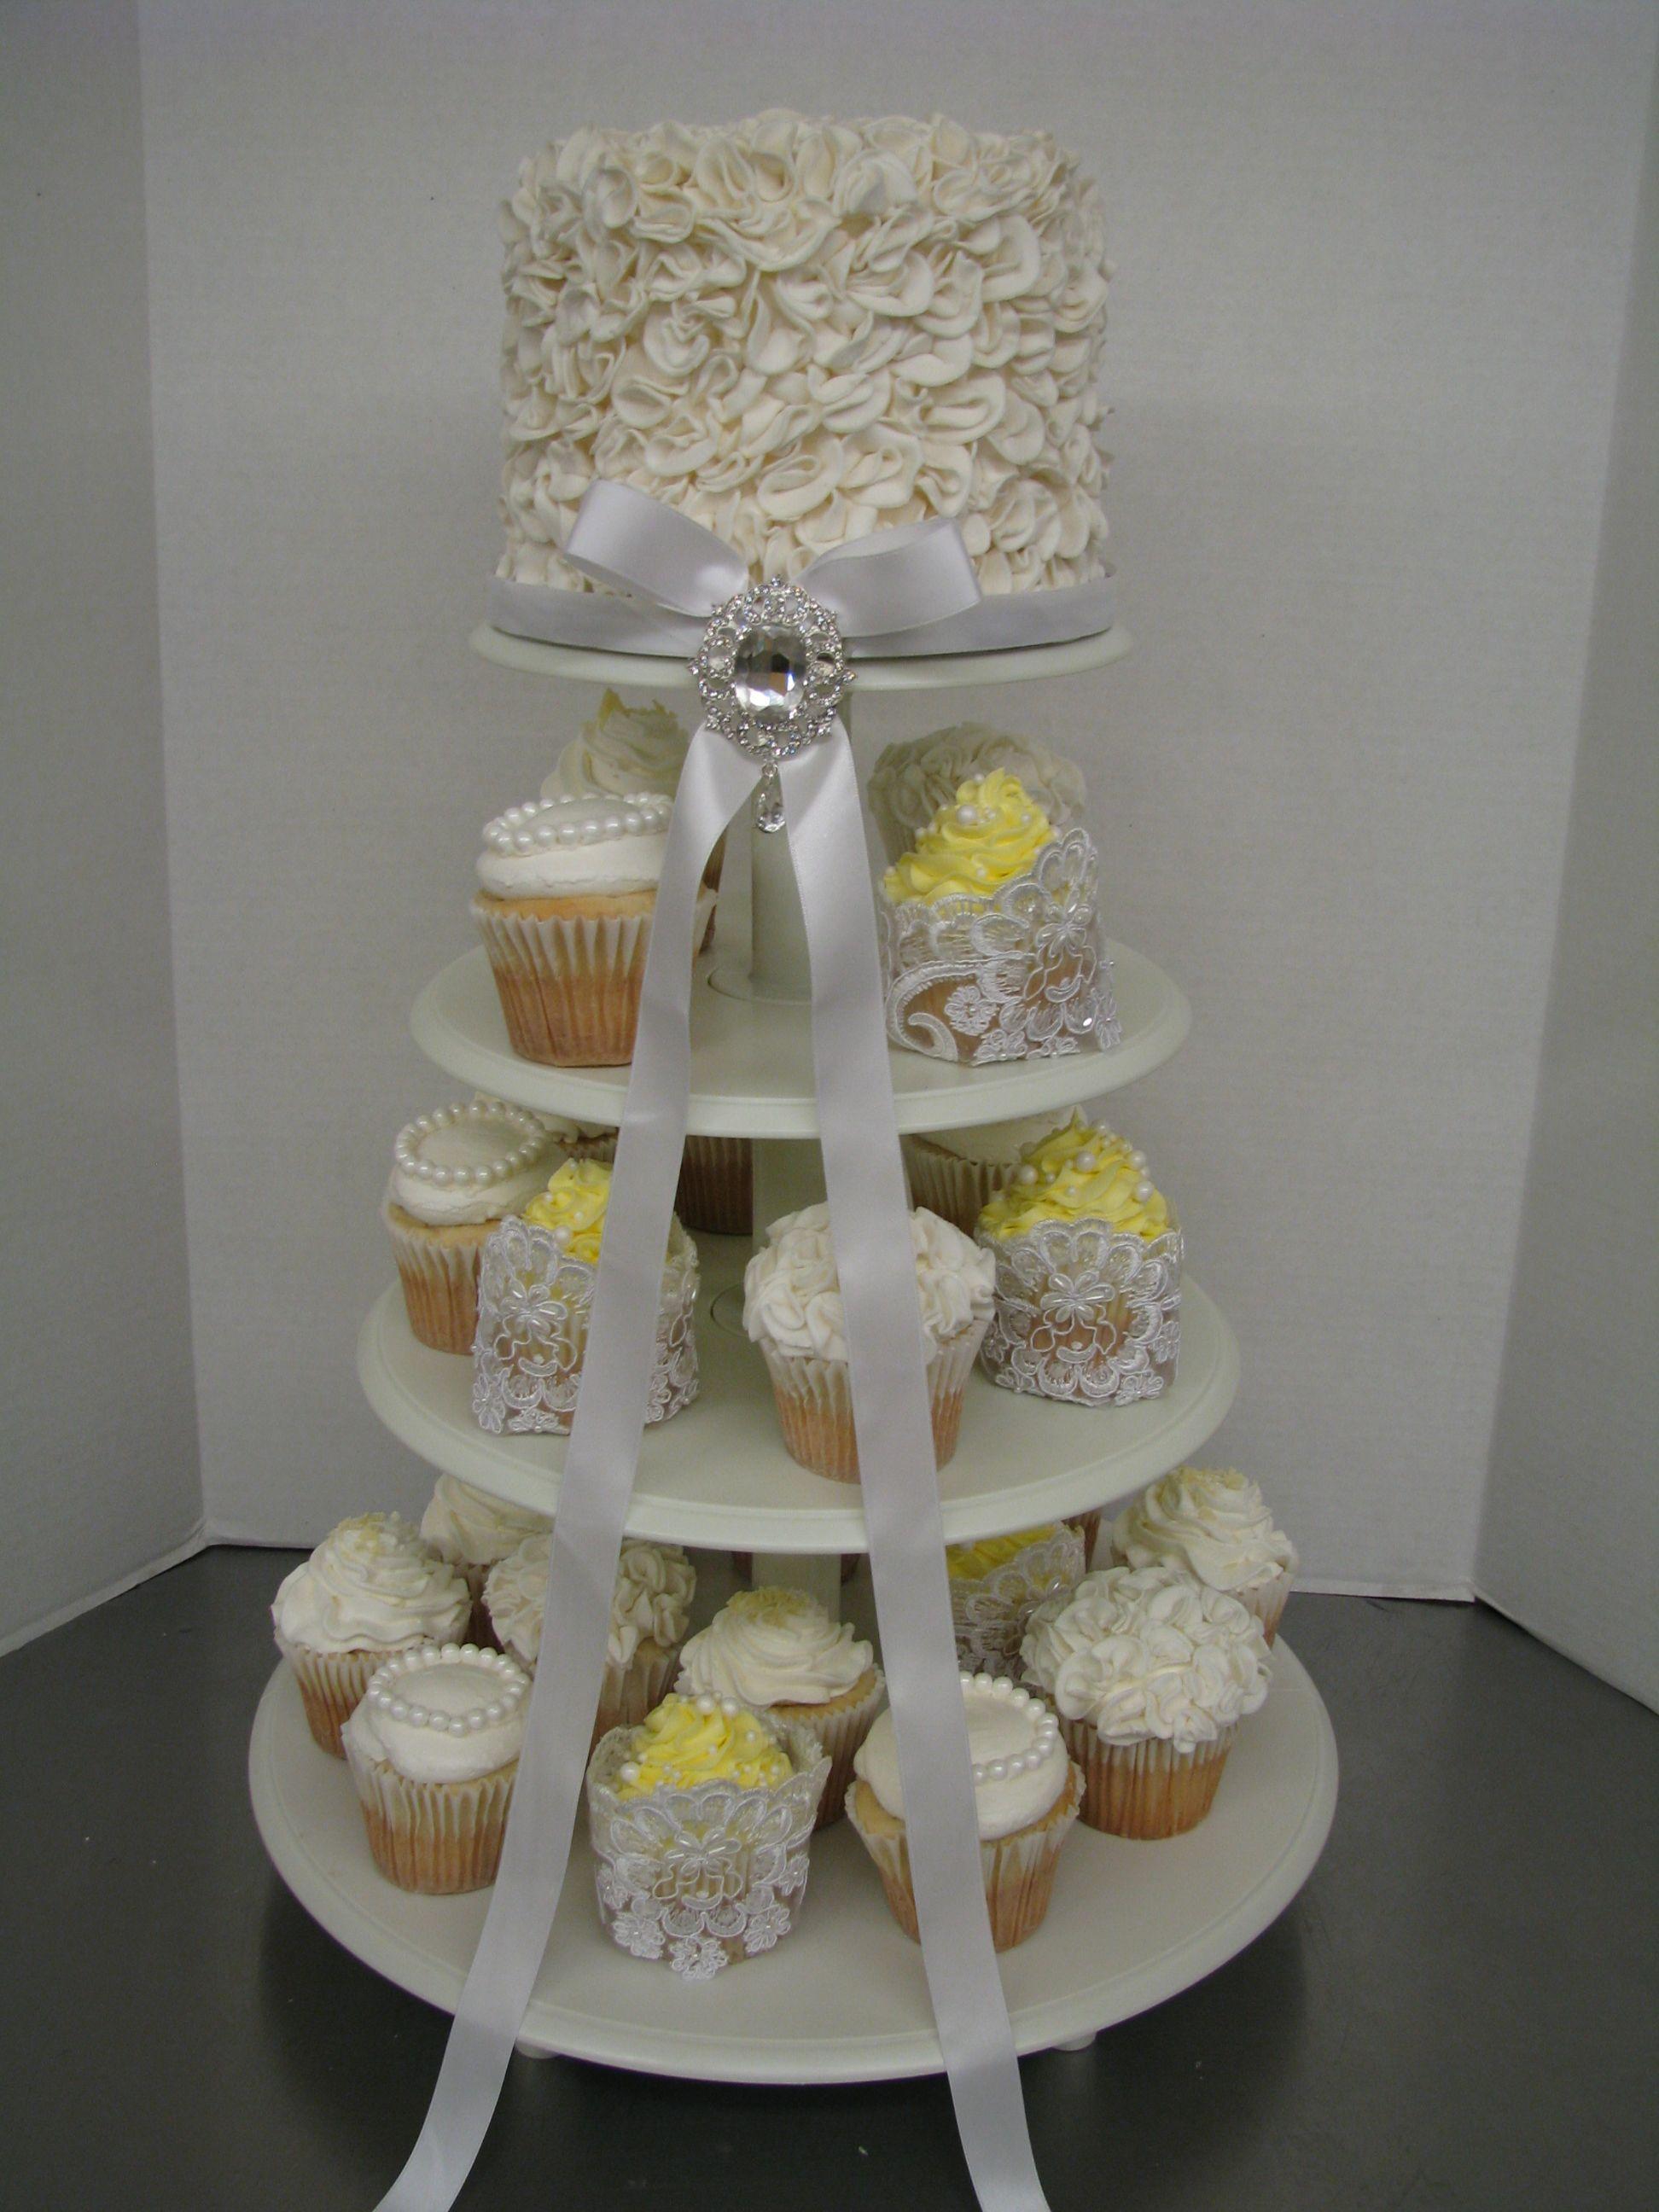 bridal shower cakes cupcakes pinterest. Black Bedroom Furniture Sets. Home Design Ideas